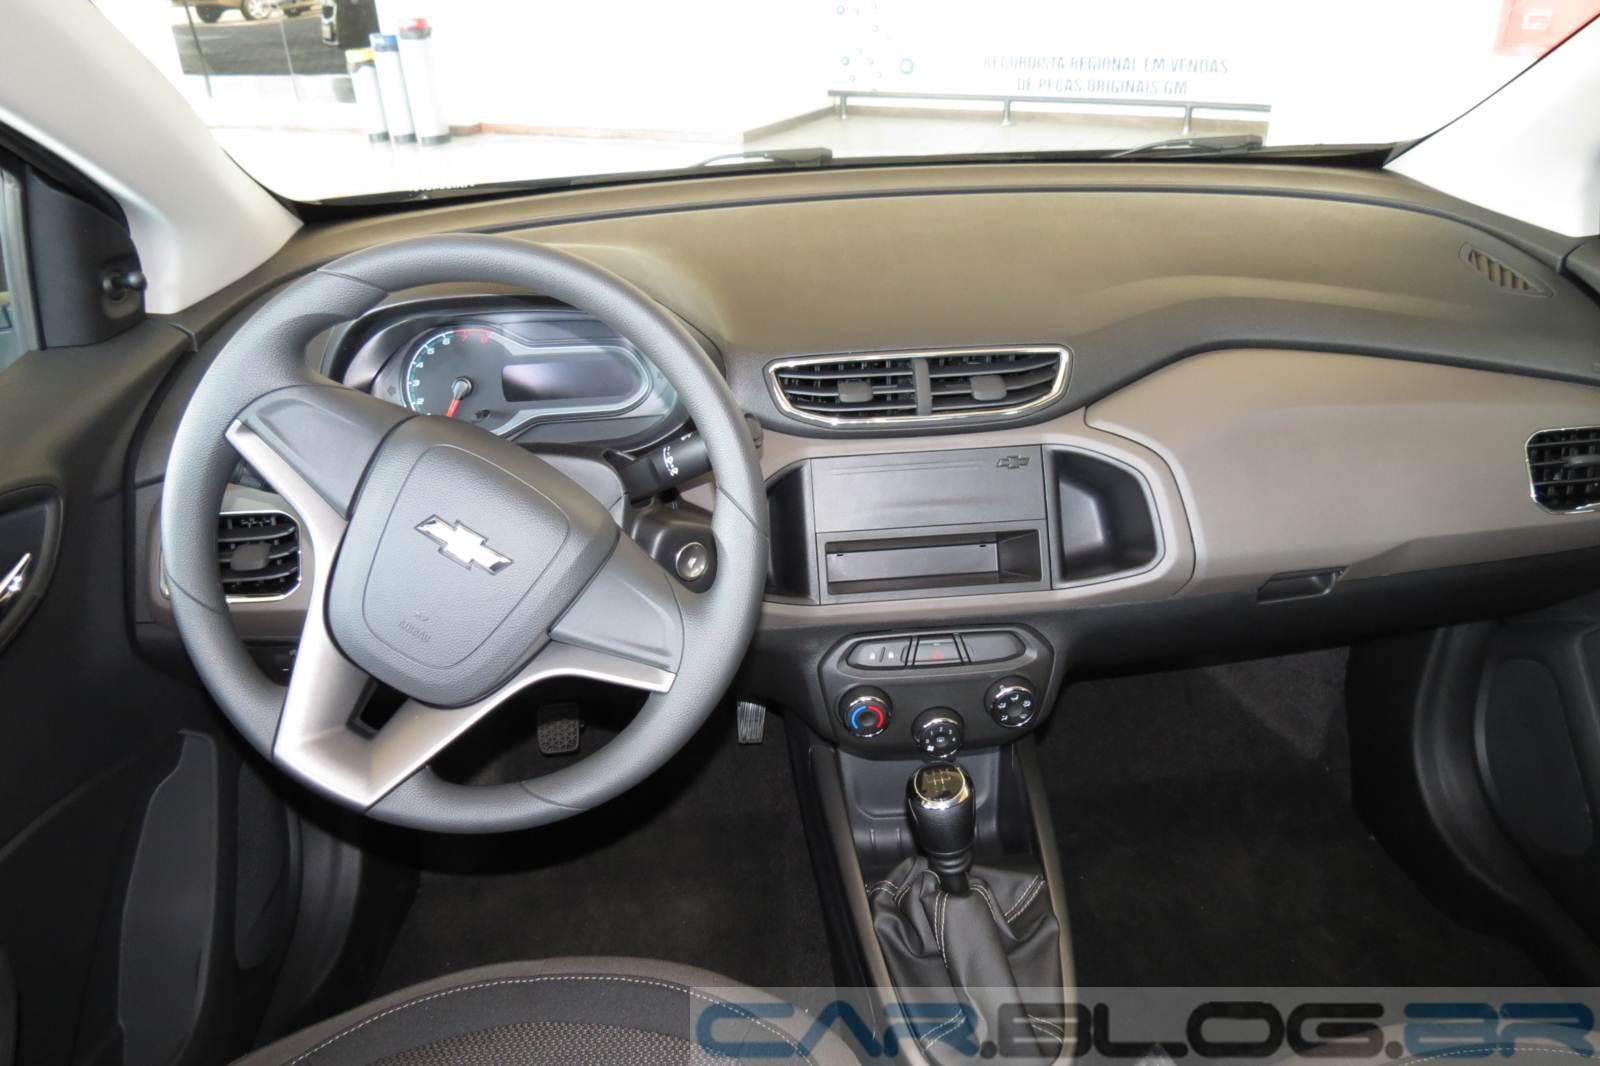 Chevrolet Onix LT 1.0 - interior